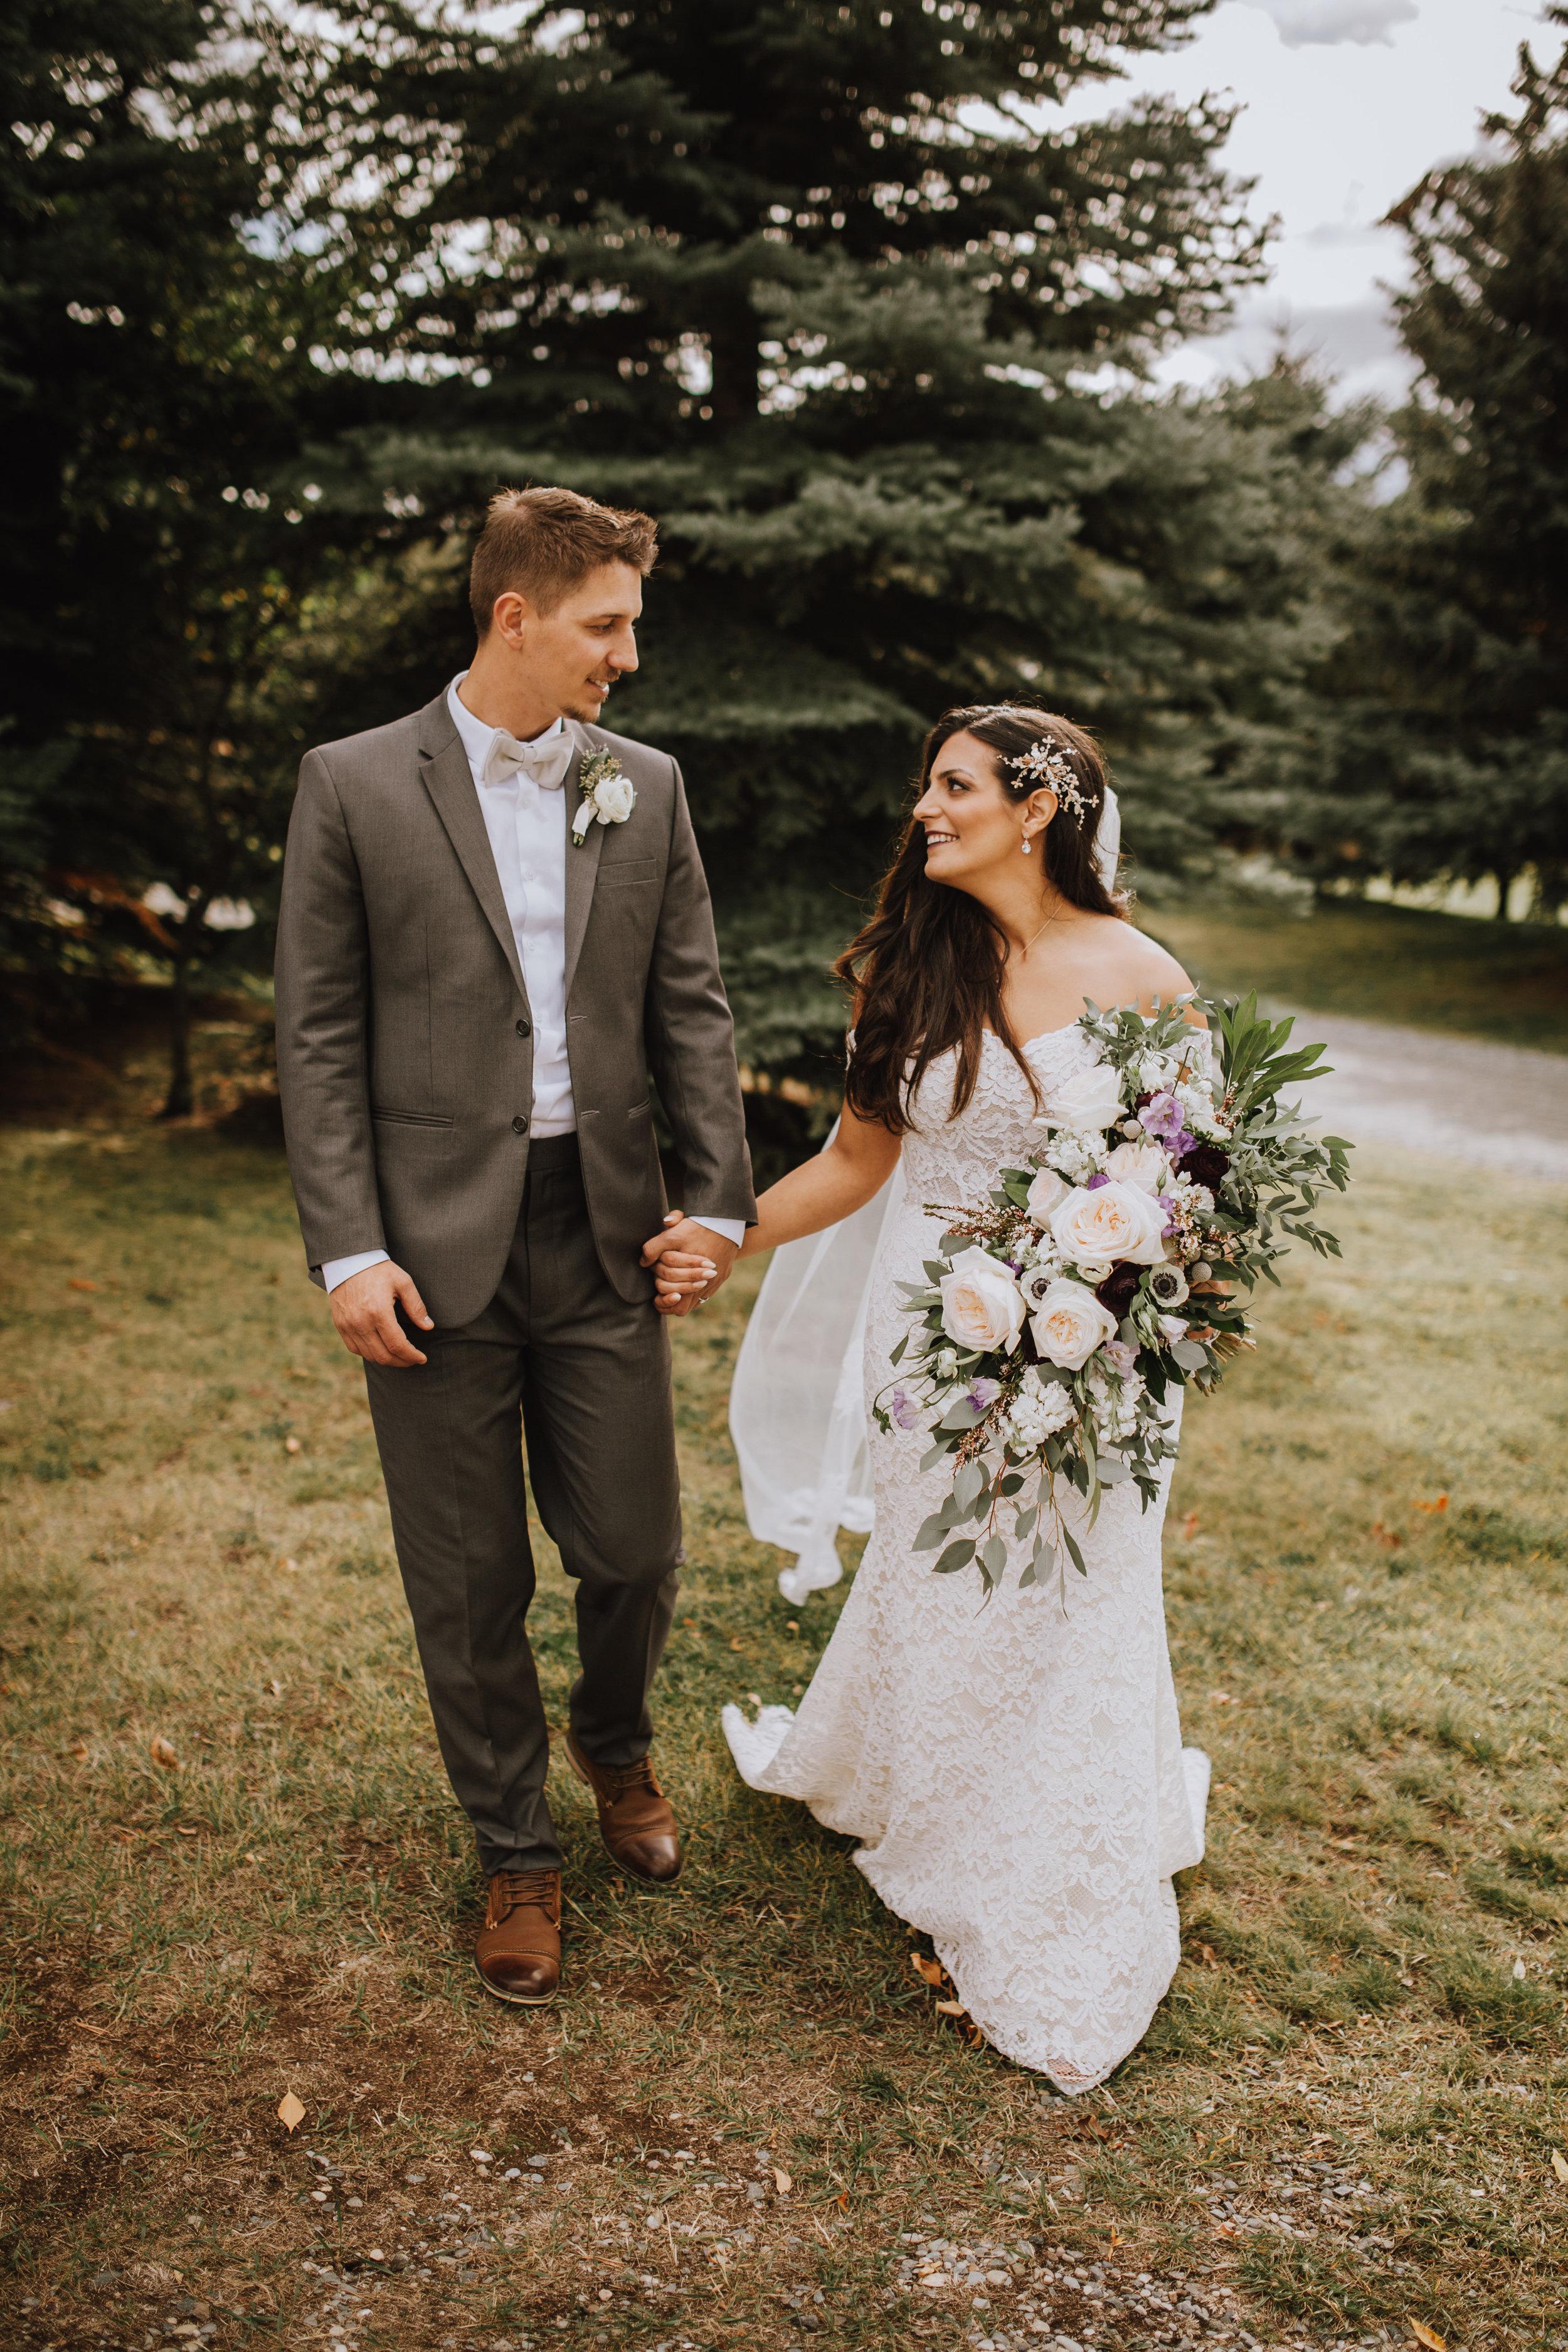 Kurt + Melissa 4 - Bridal Portraits-20.jpg